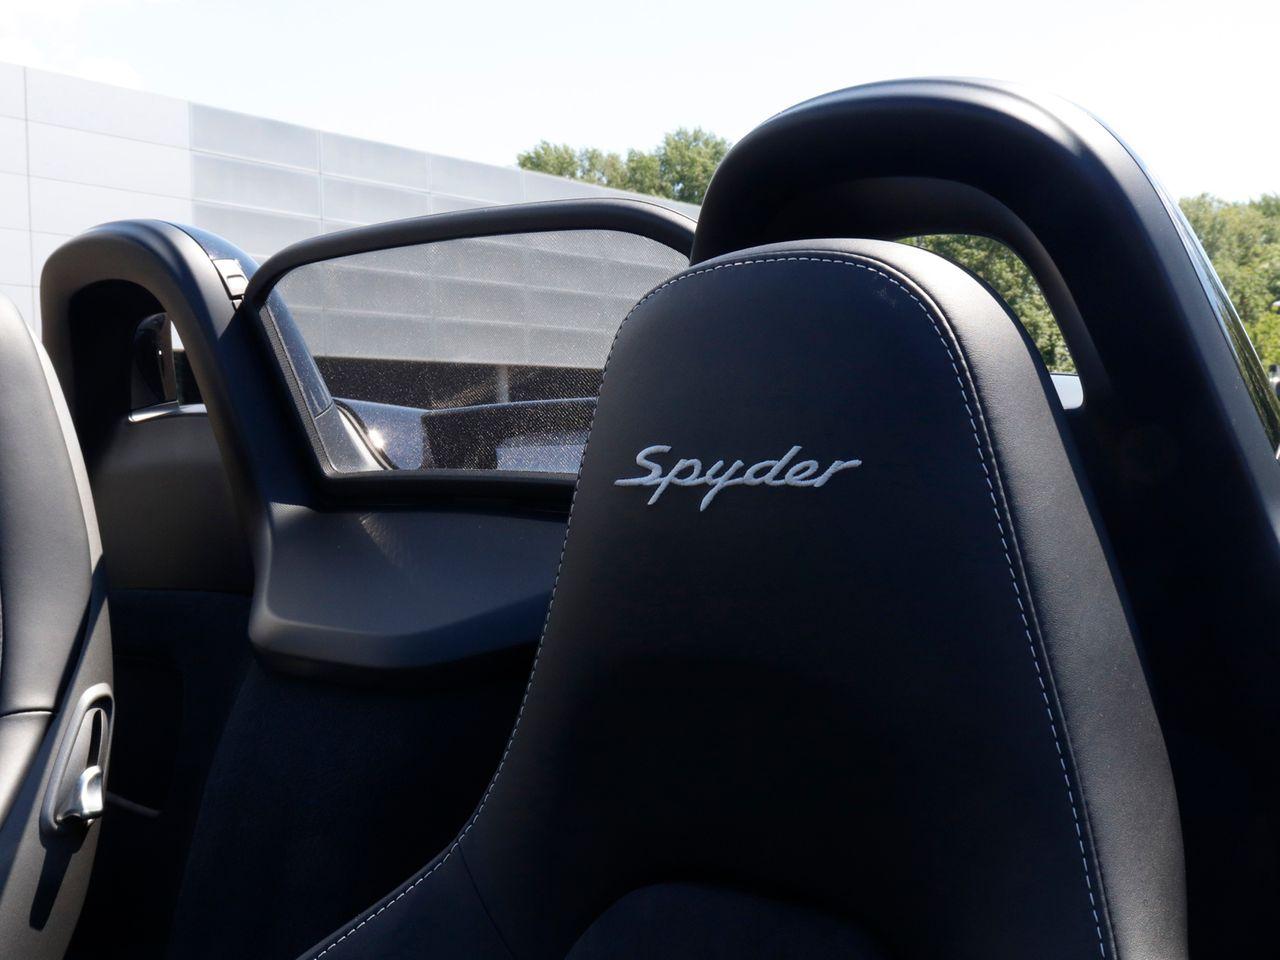 Boxster (981) SPYDER (1) image 08